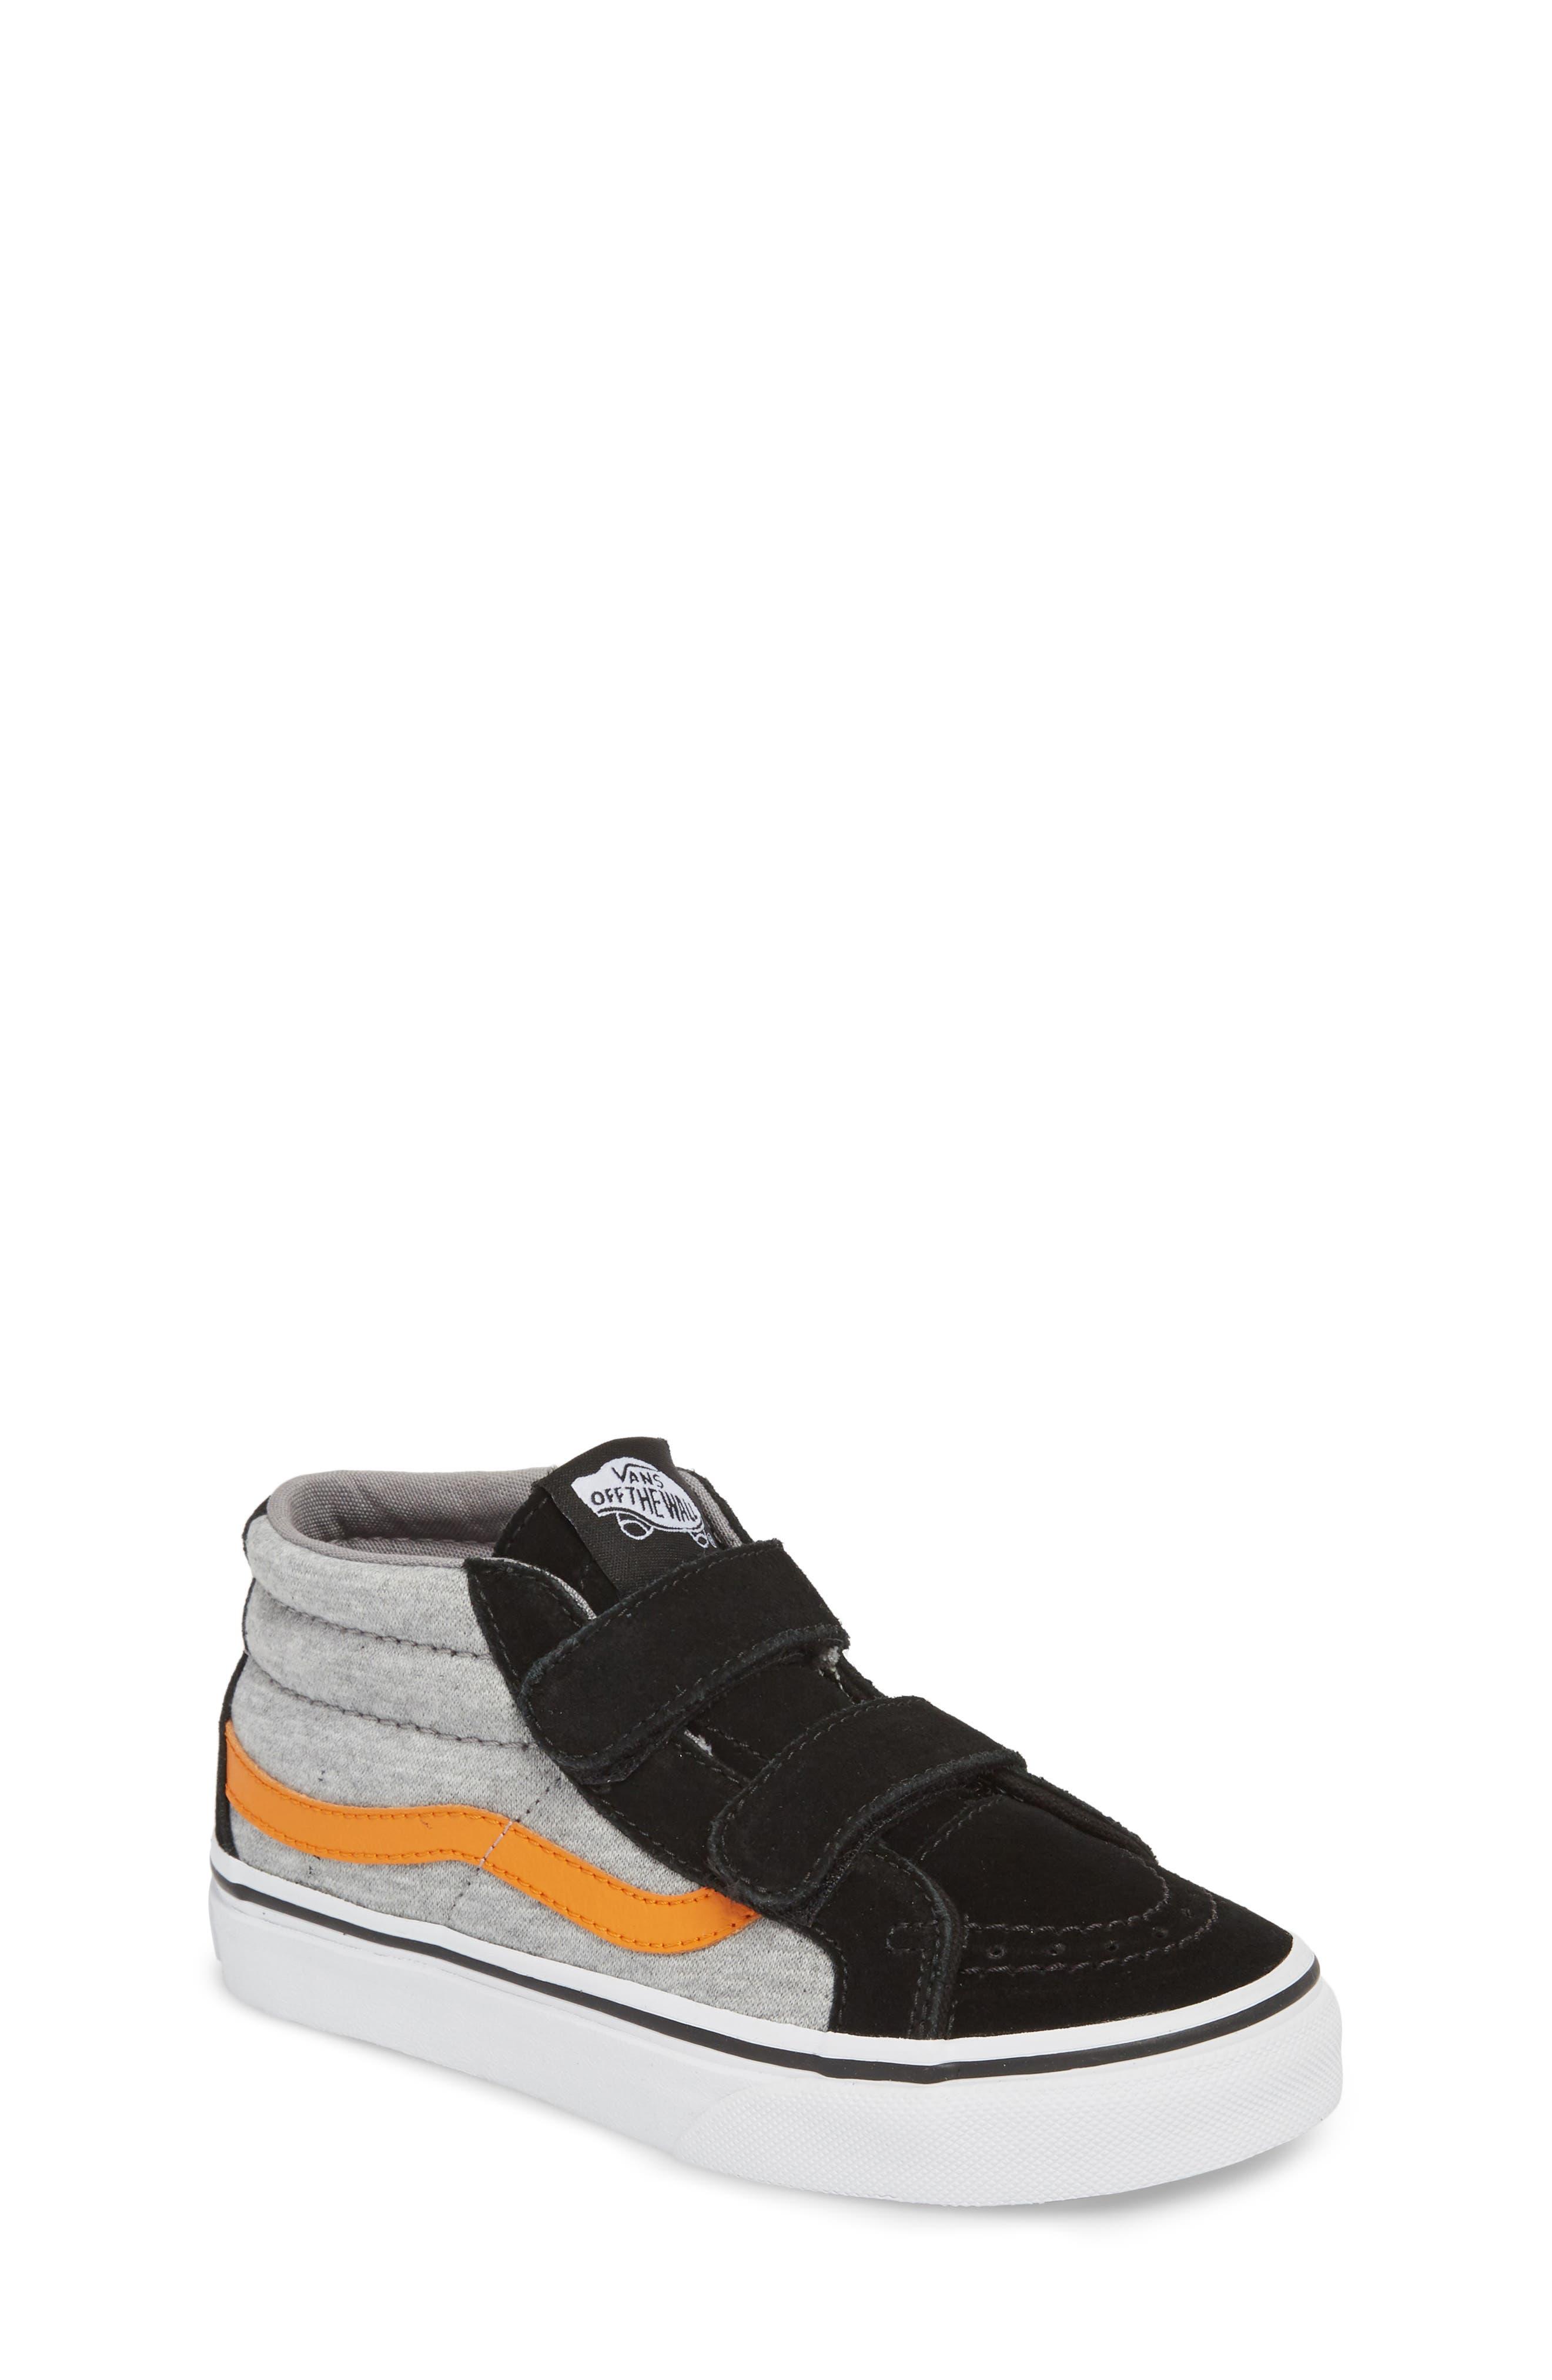 Vans Kids Green Shoes Sneakers Nordstrom